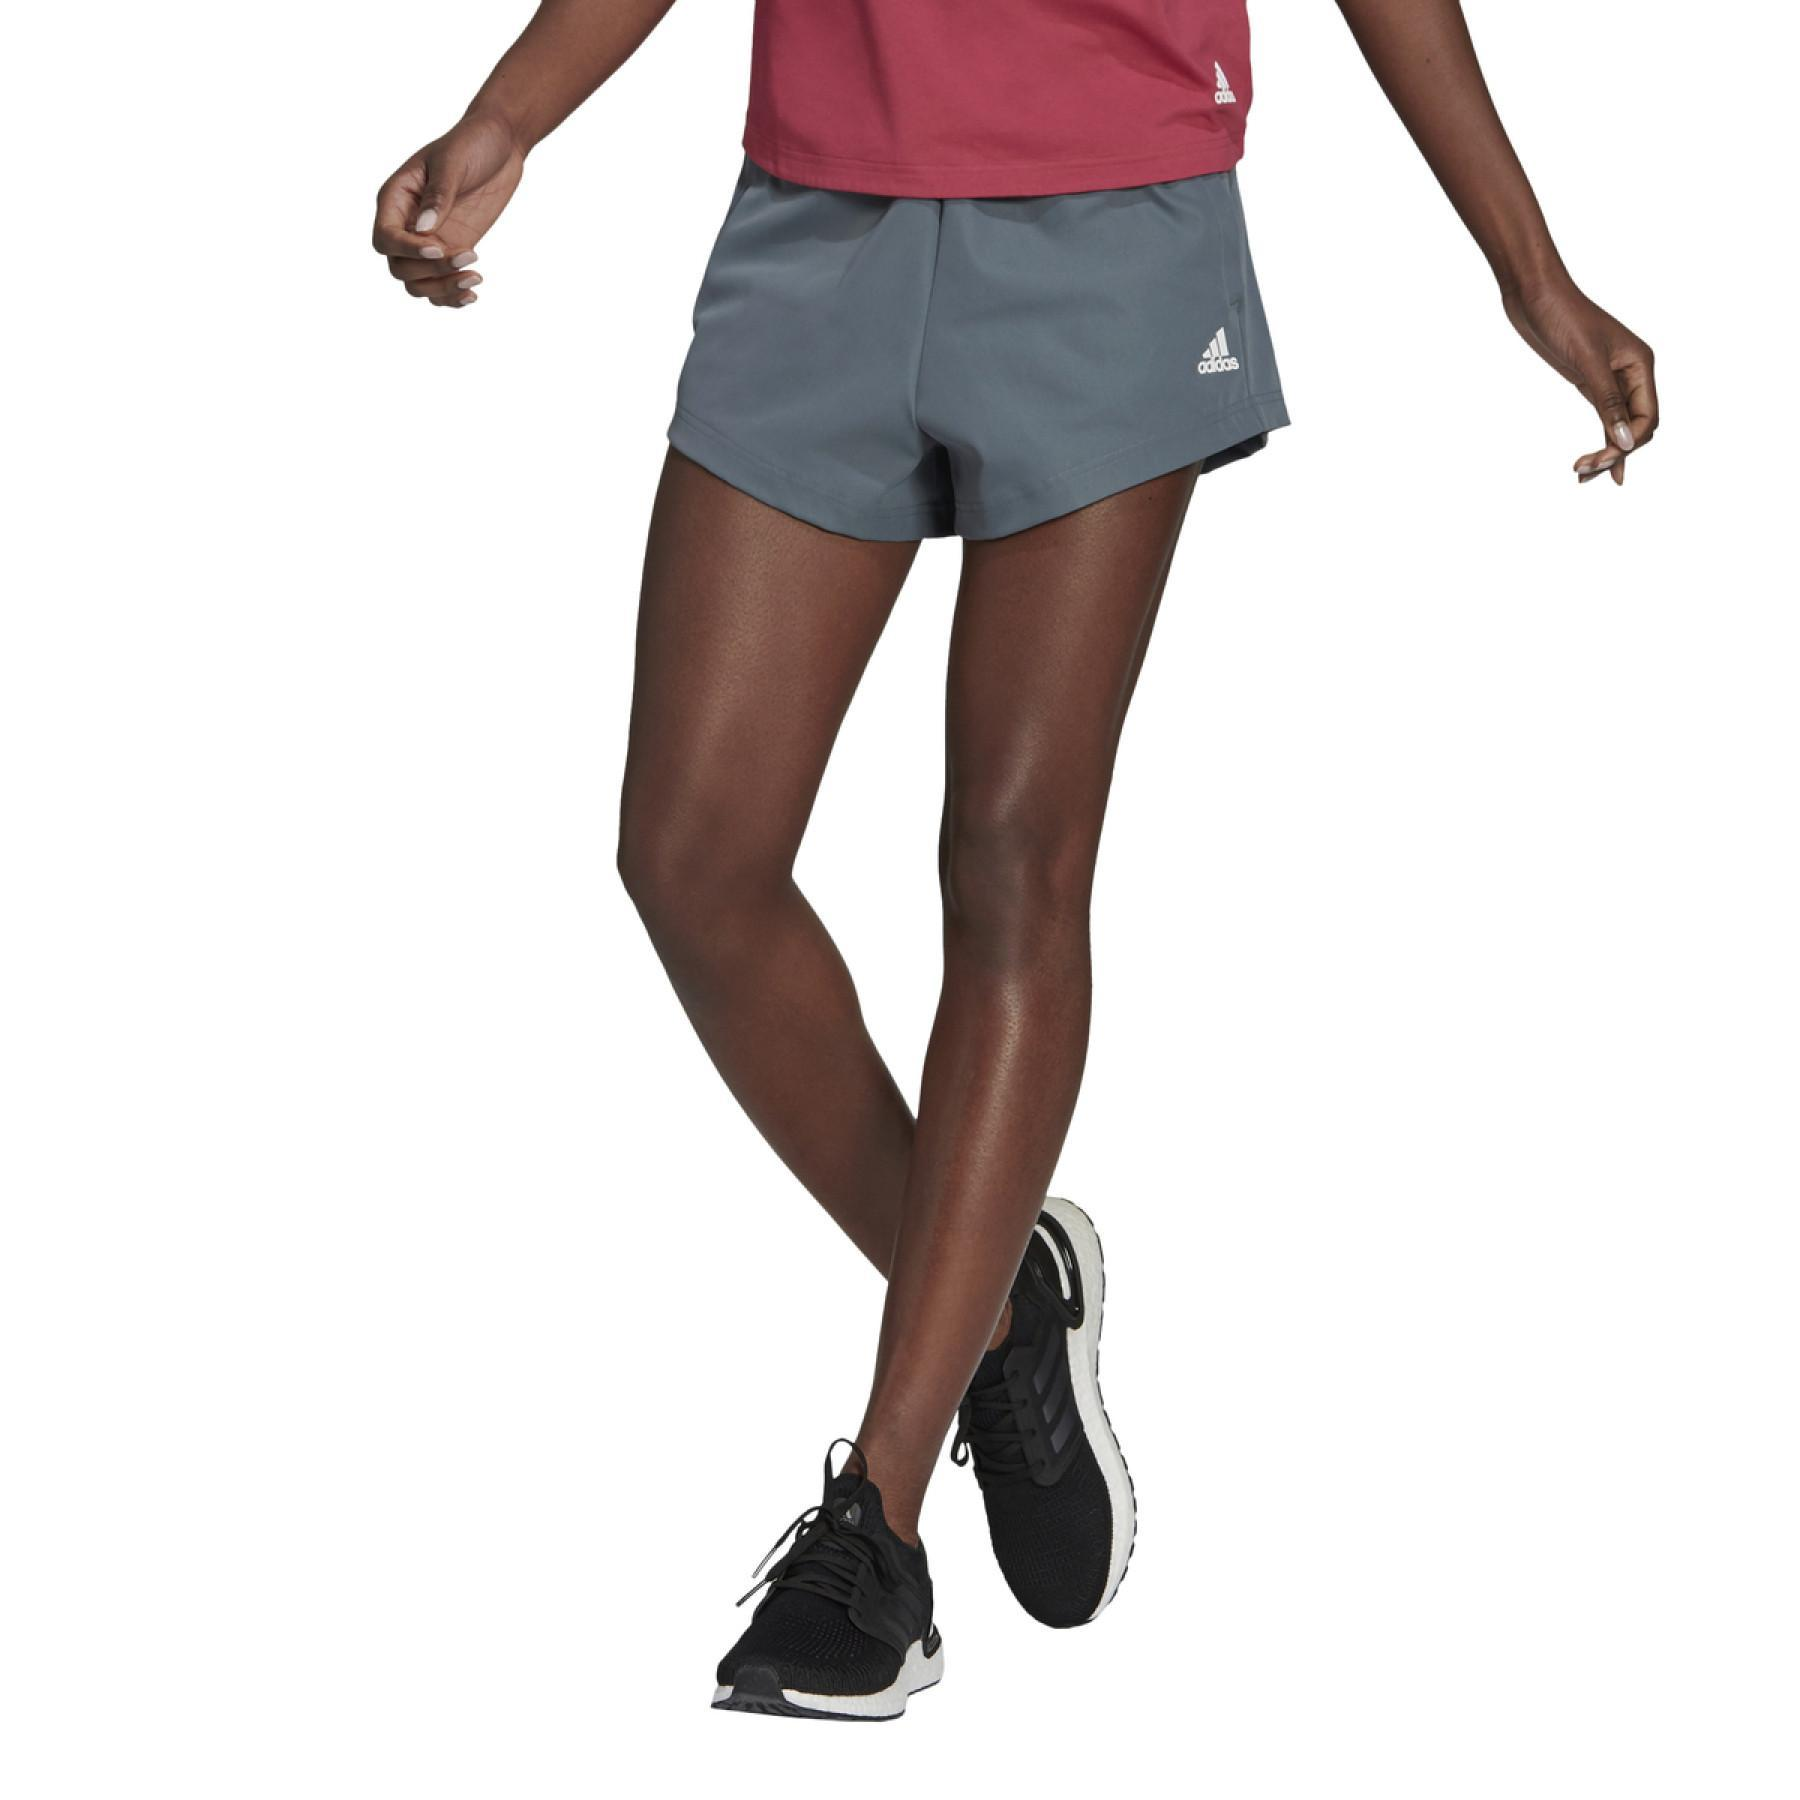 adidasportswearummer Pack Women's Shorts